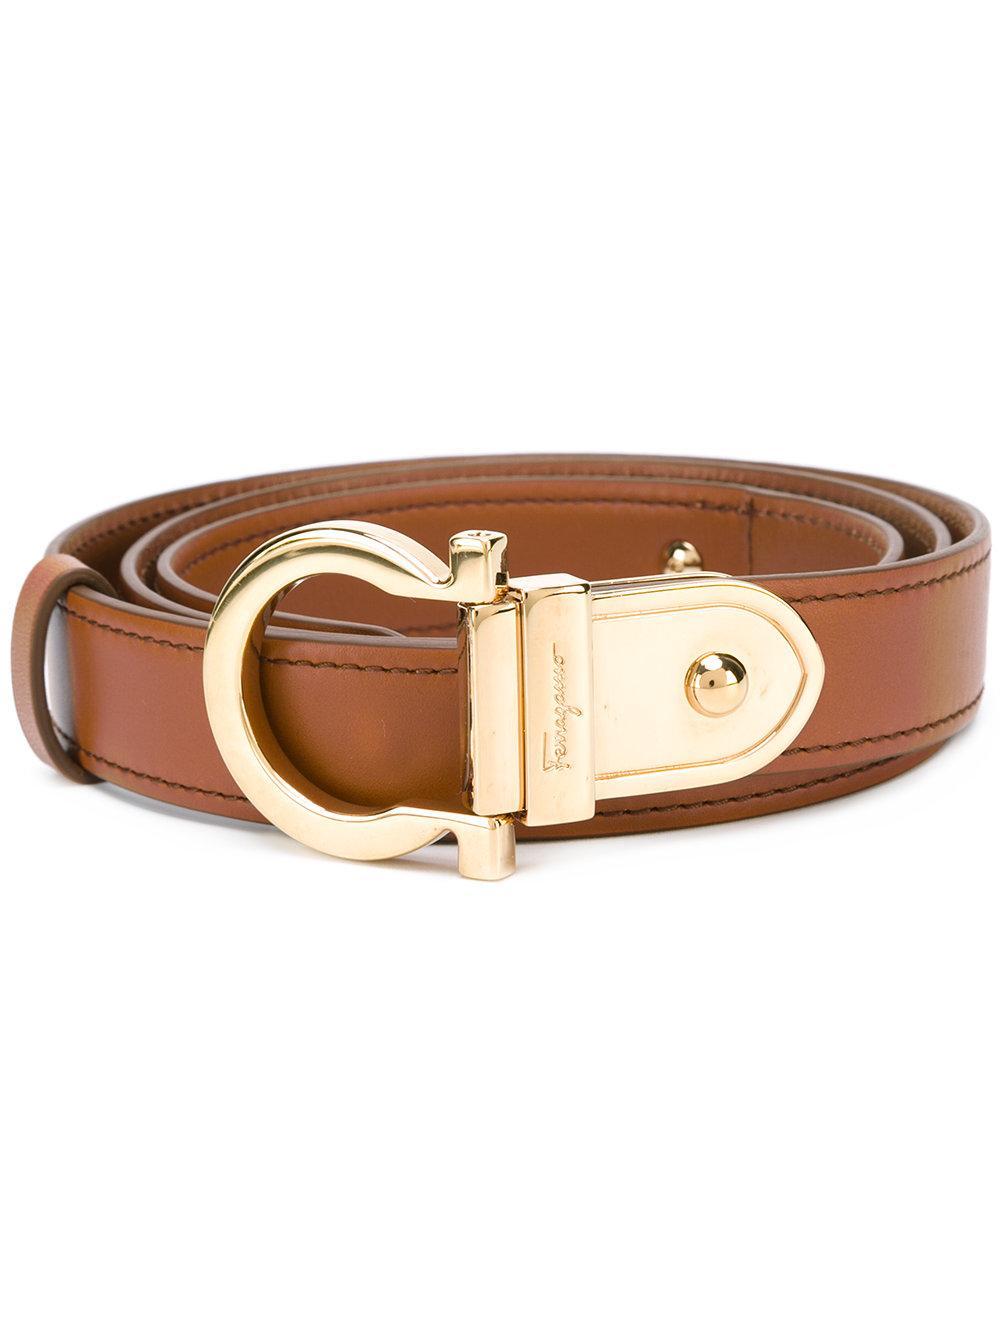 ferragamo contrast gancio buckle belt in brown lyst